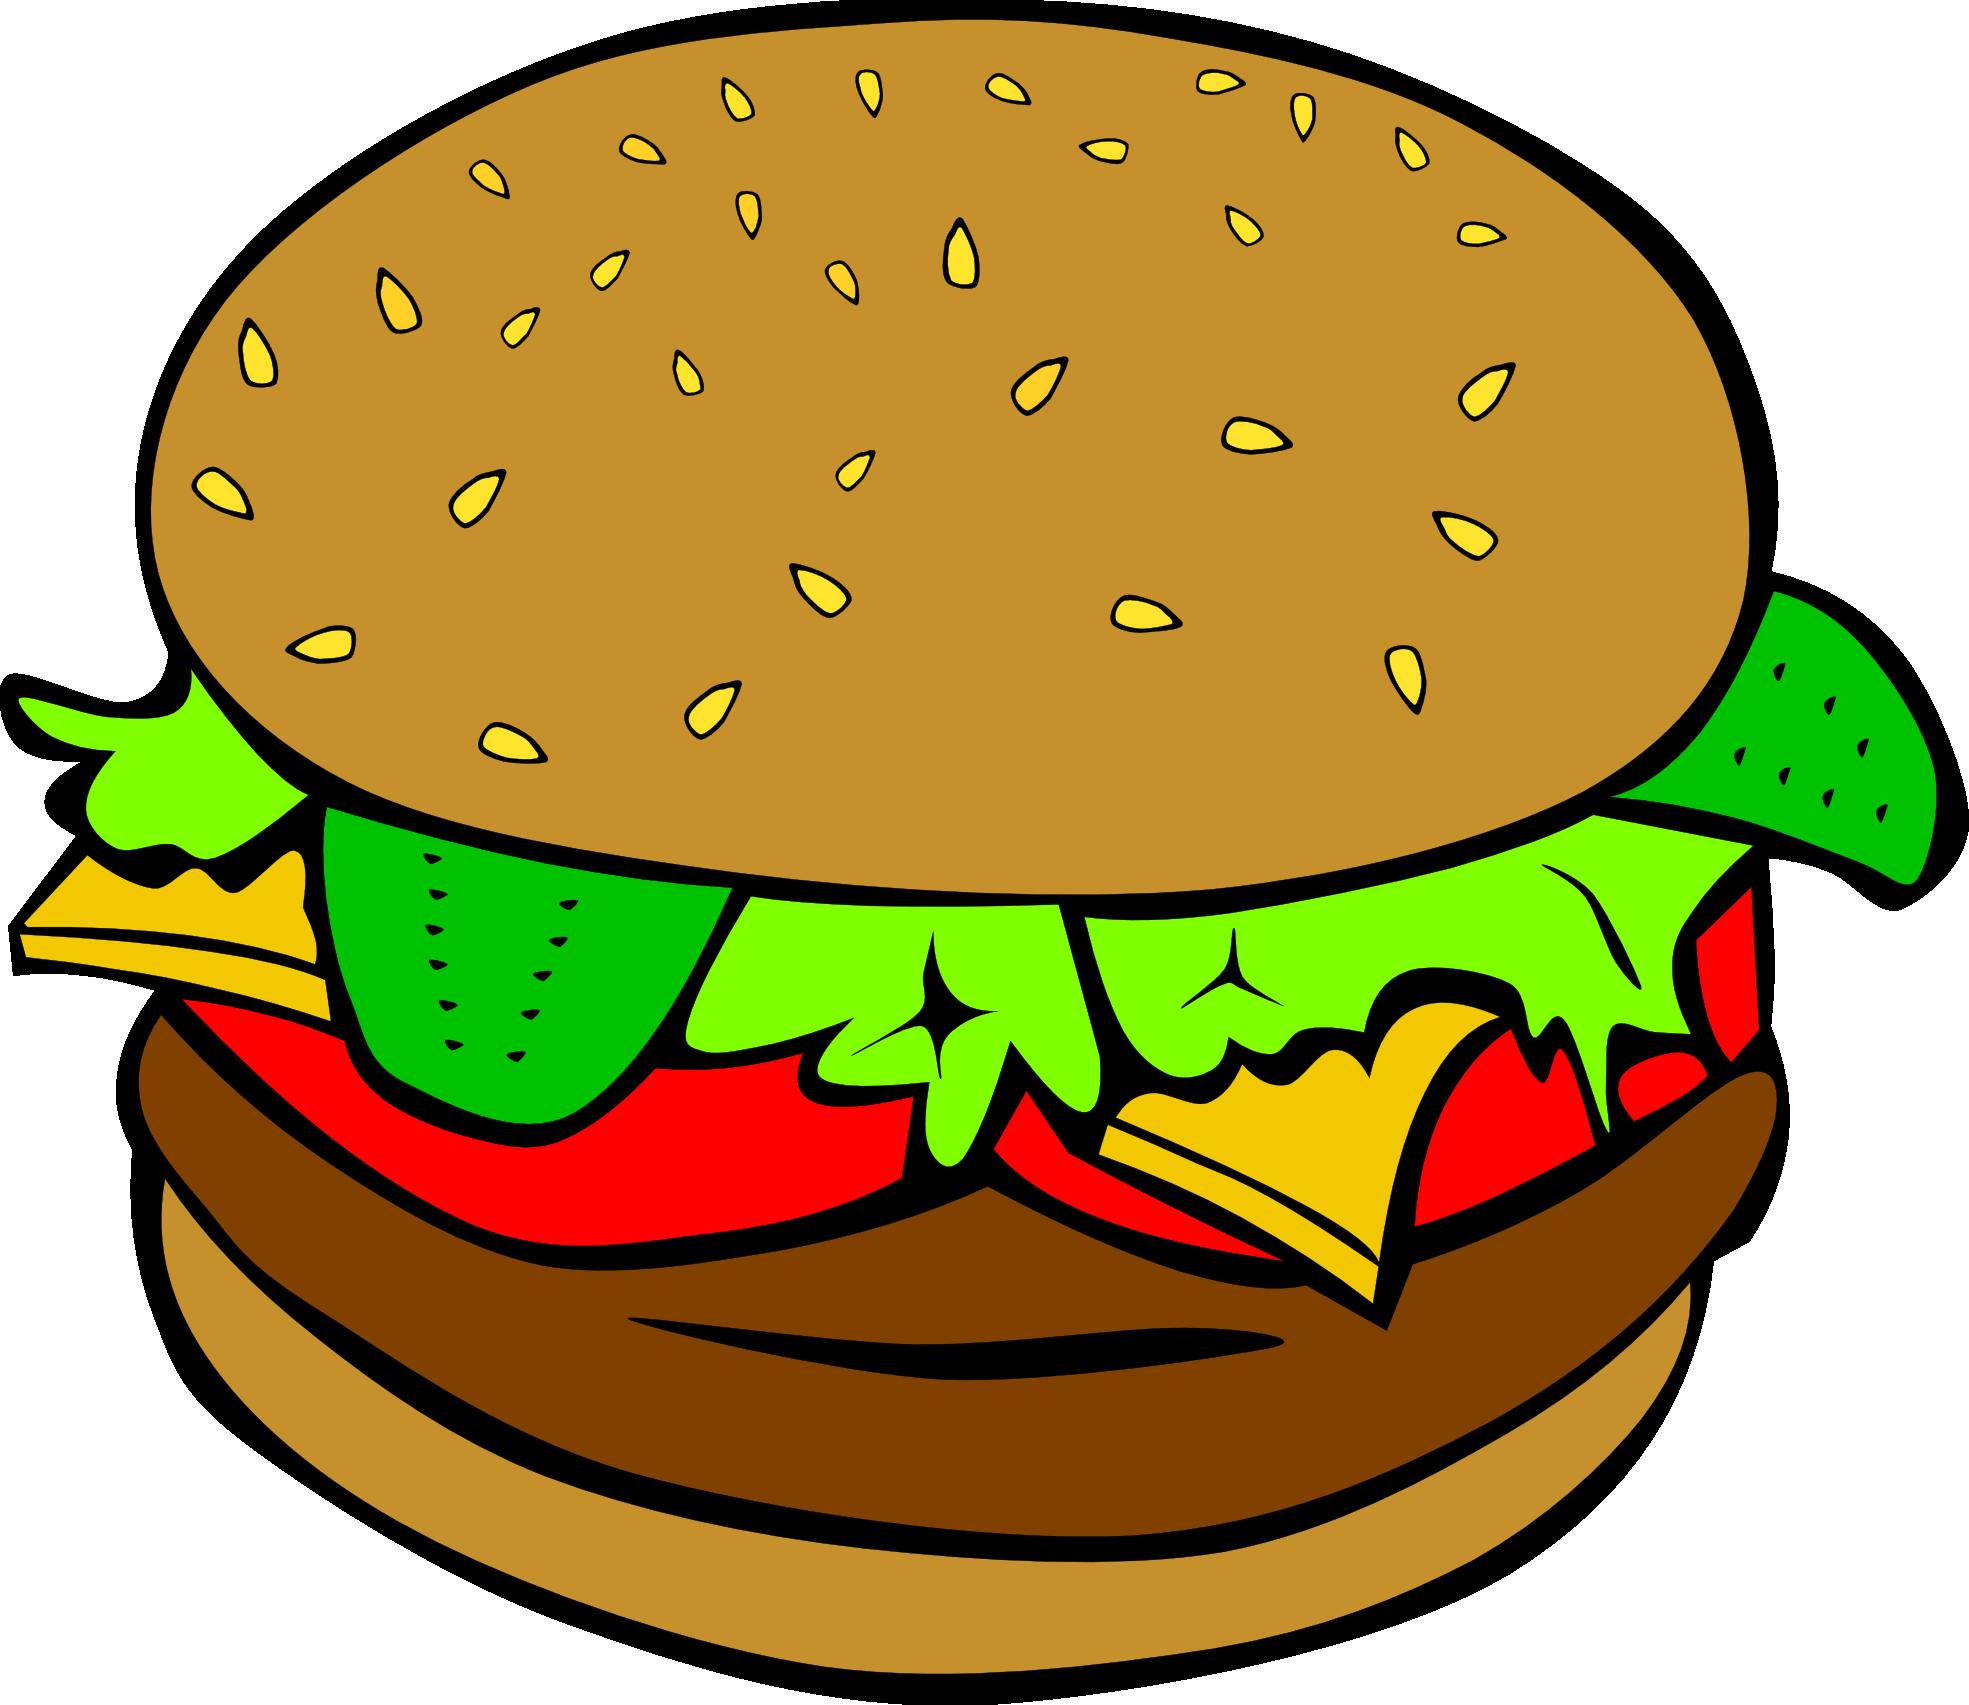 Free images emoji pinterest. Clipart horse food